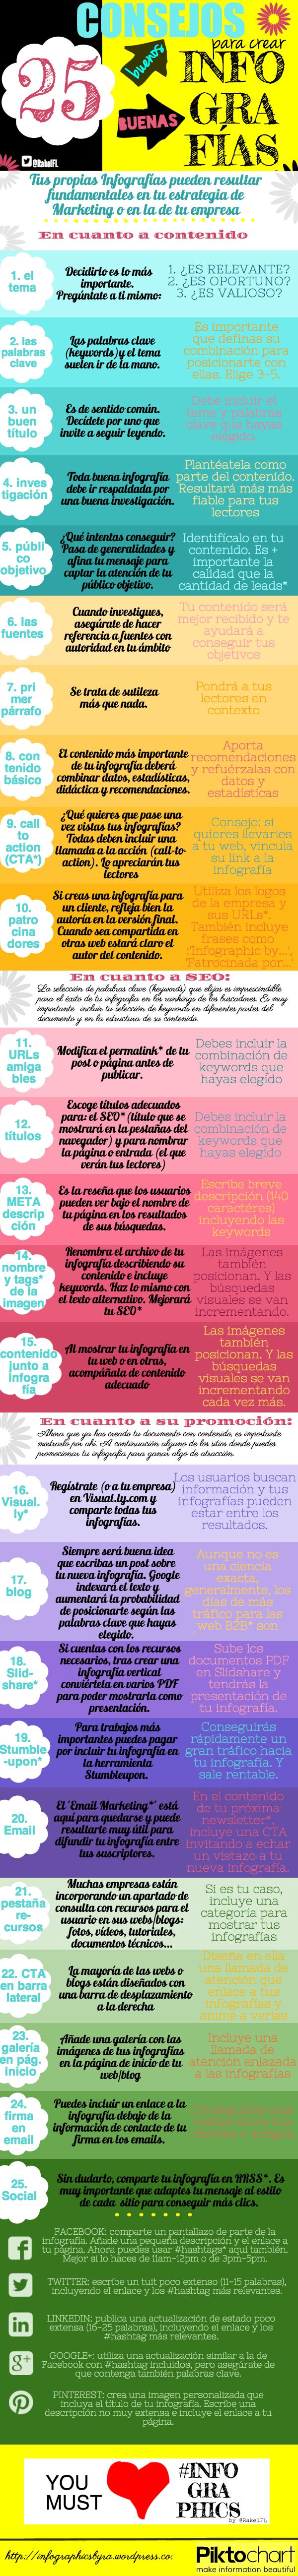 http://infographicsbyra.files.wordpress.com/2013/09/25-consejos-para-disec3b1ar-infografc3adas-by-rakelfl-copy-15.png